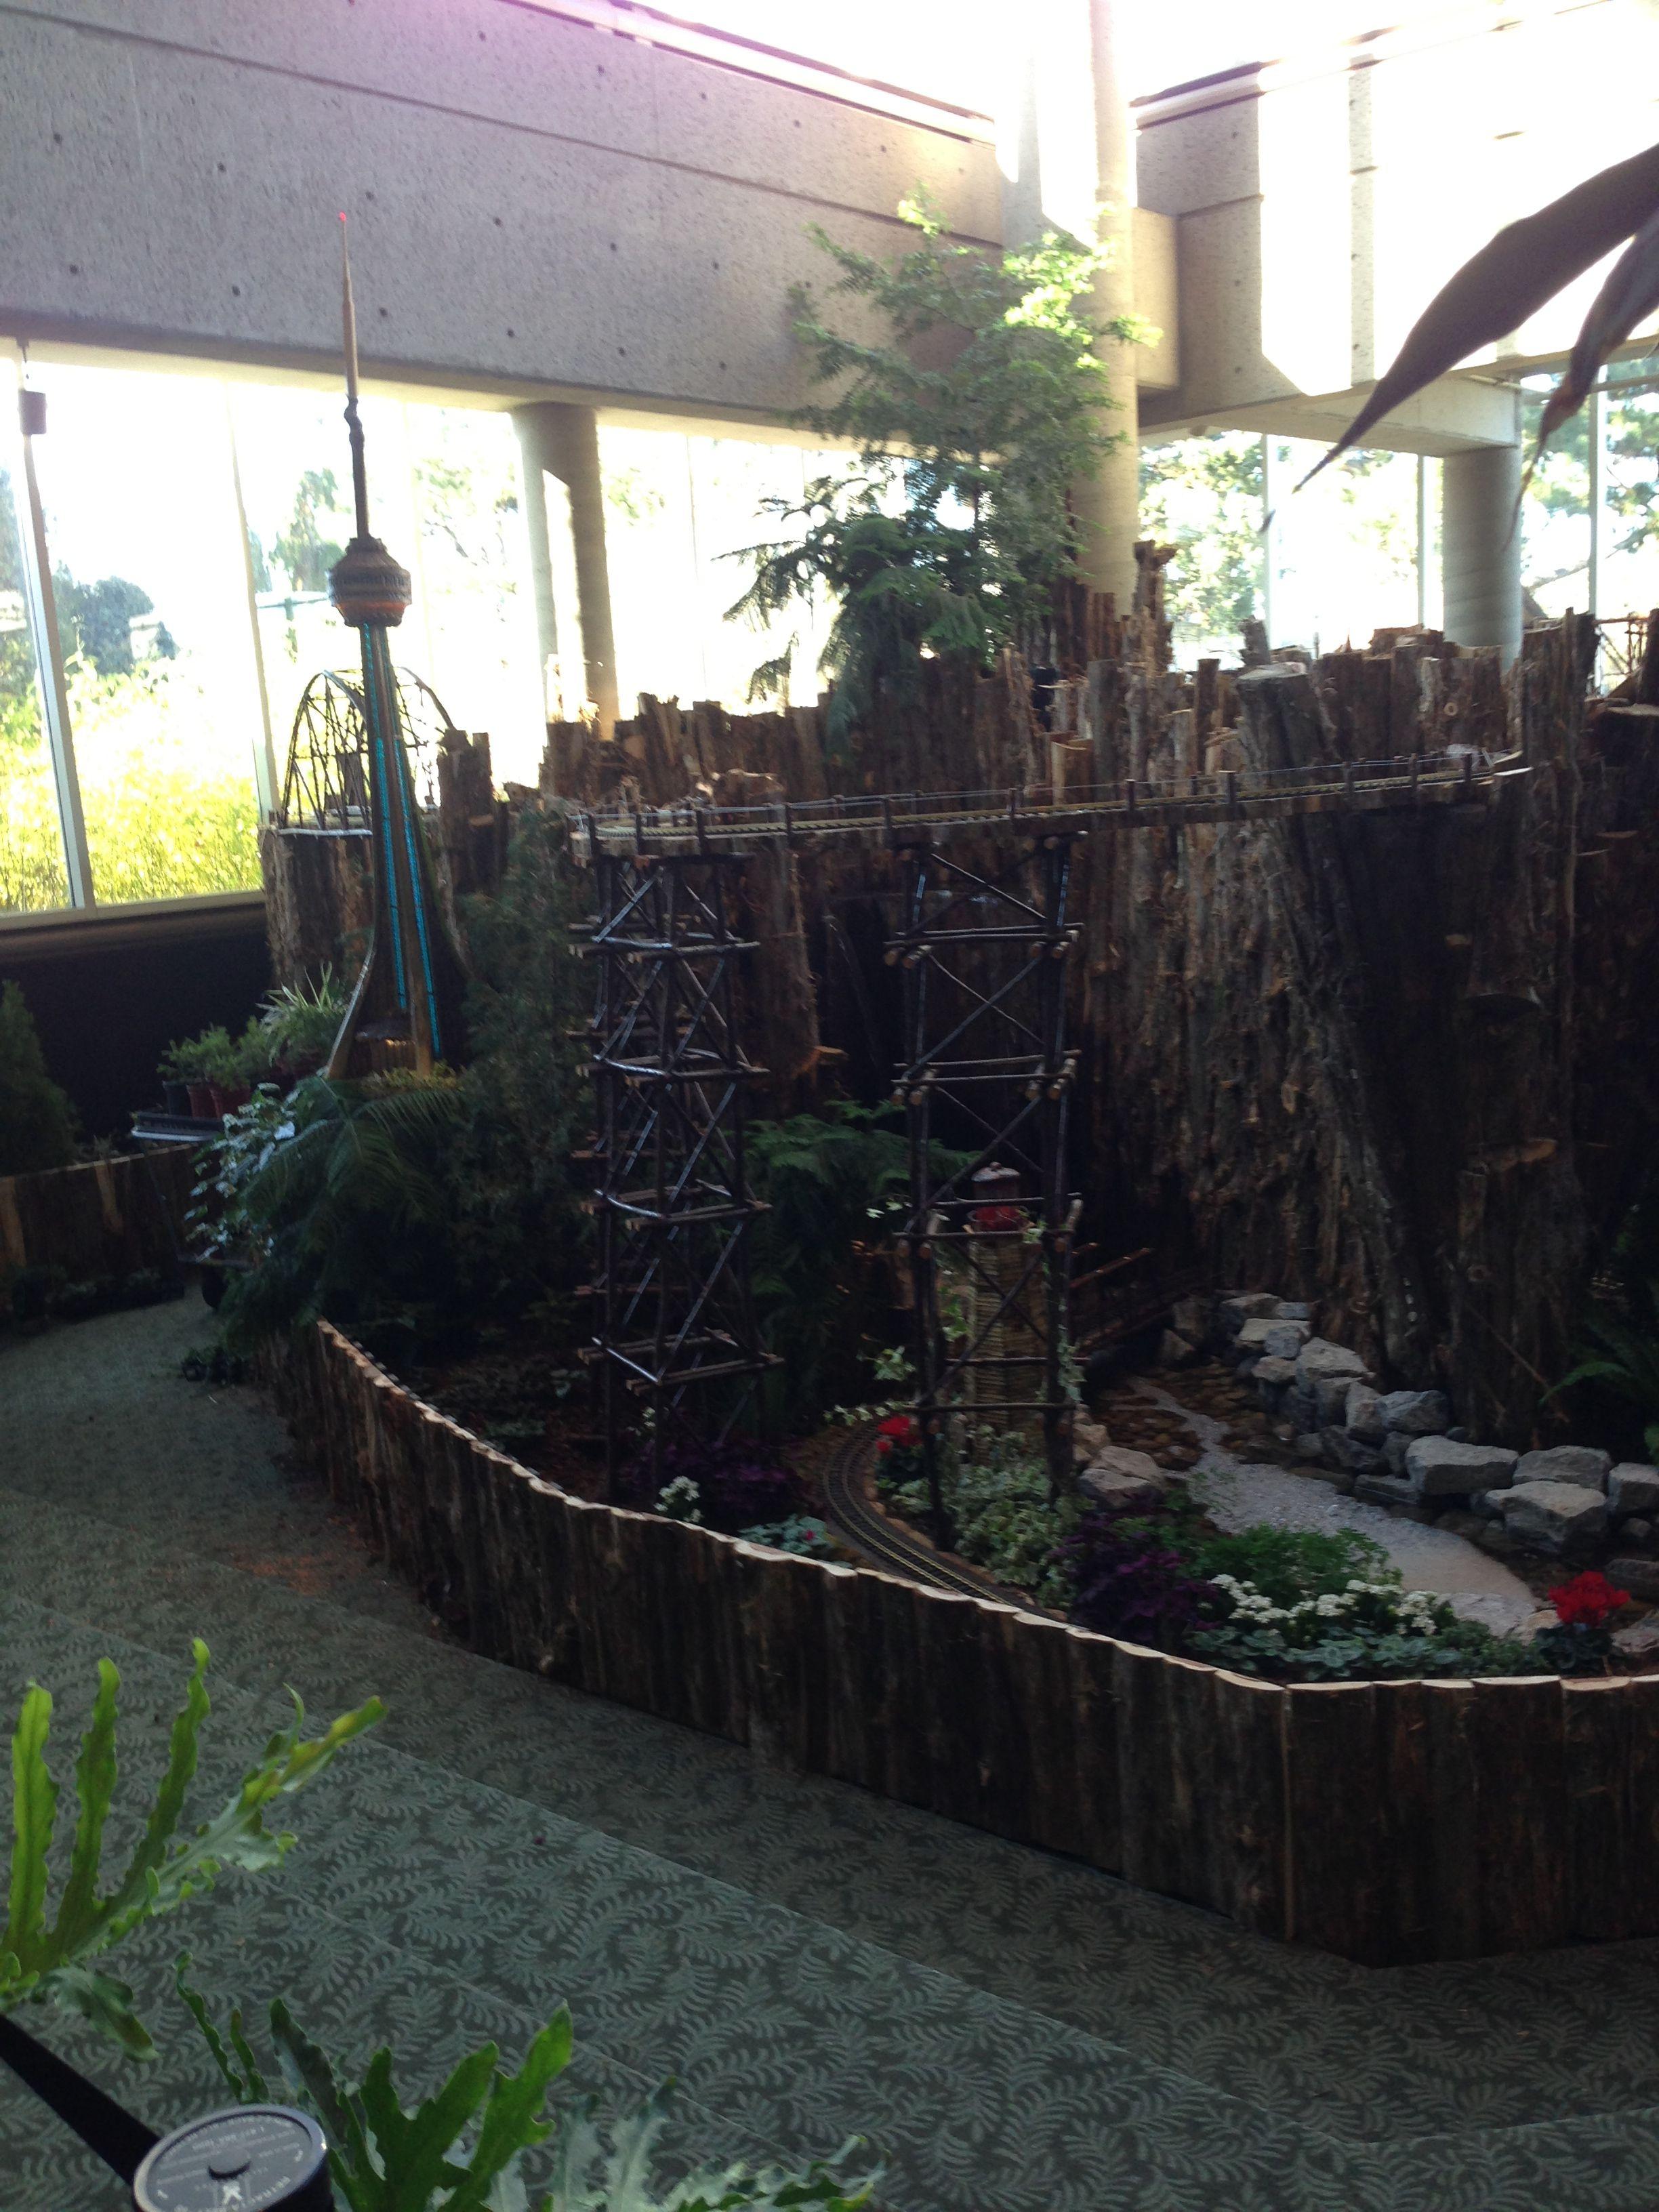 Upcoming Holiday Traditions At Rbg World Class Botanical